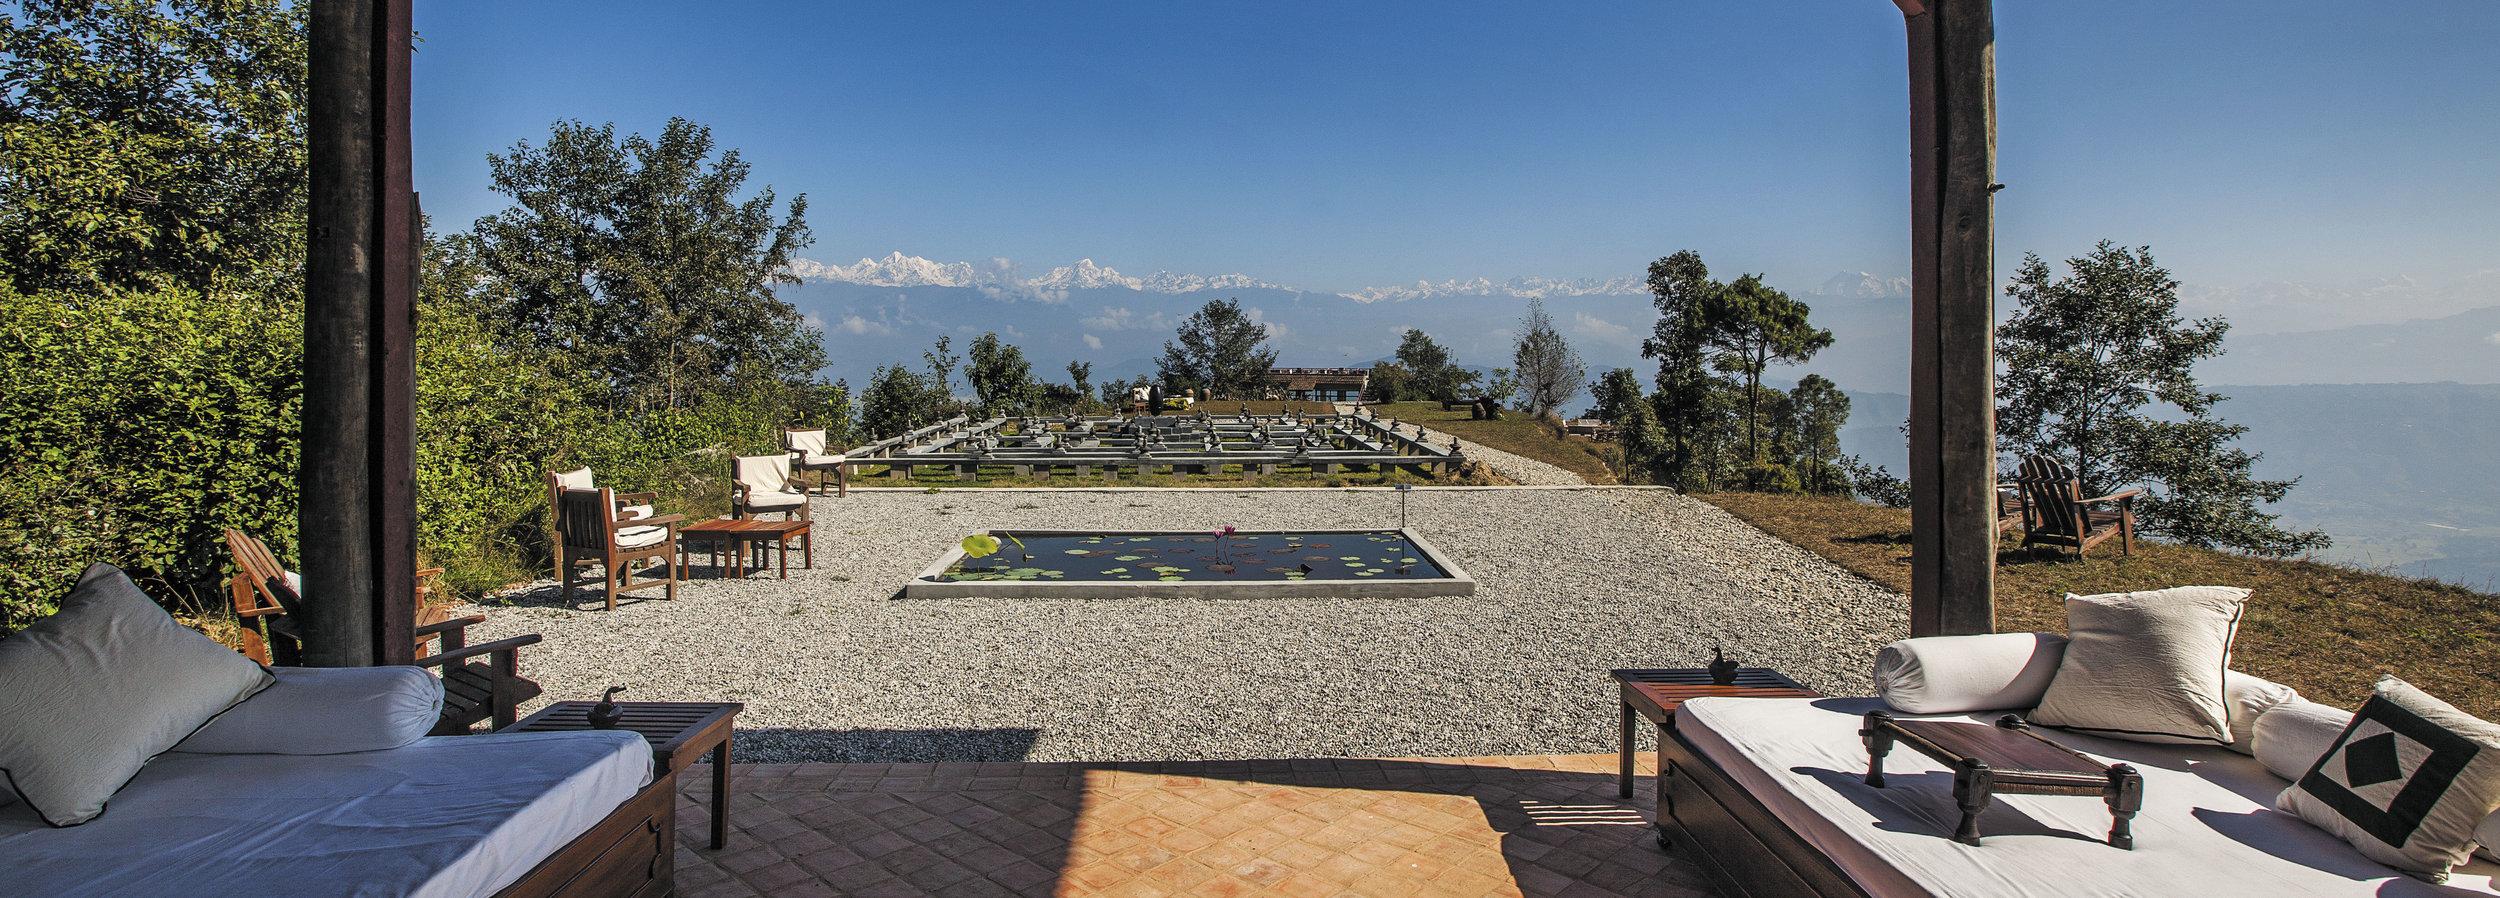 Dwarika's Resort - NEPAL